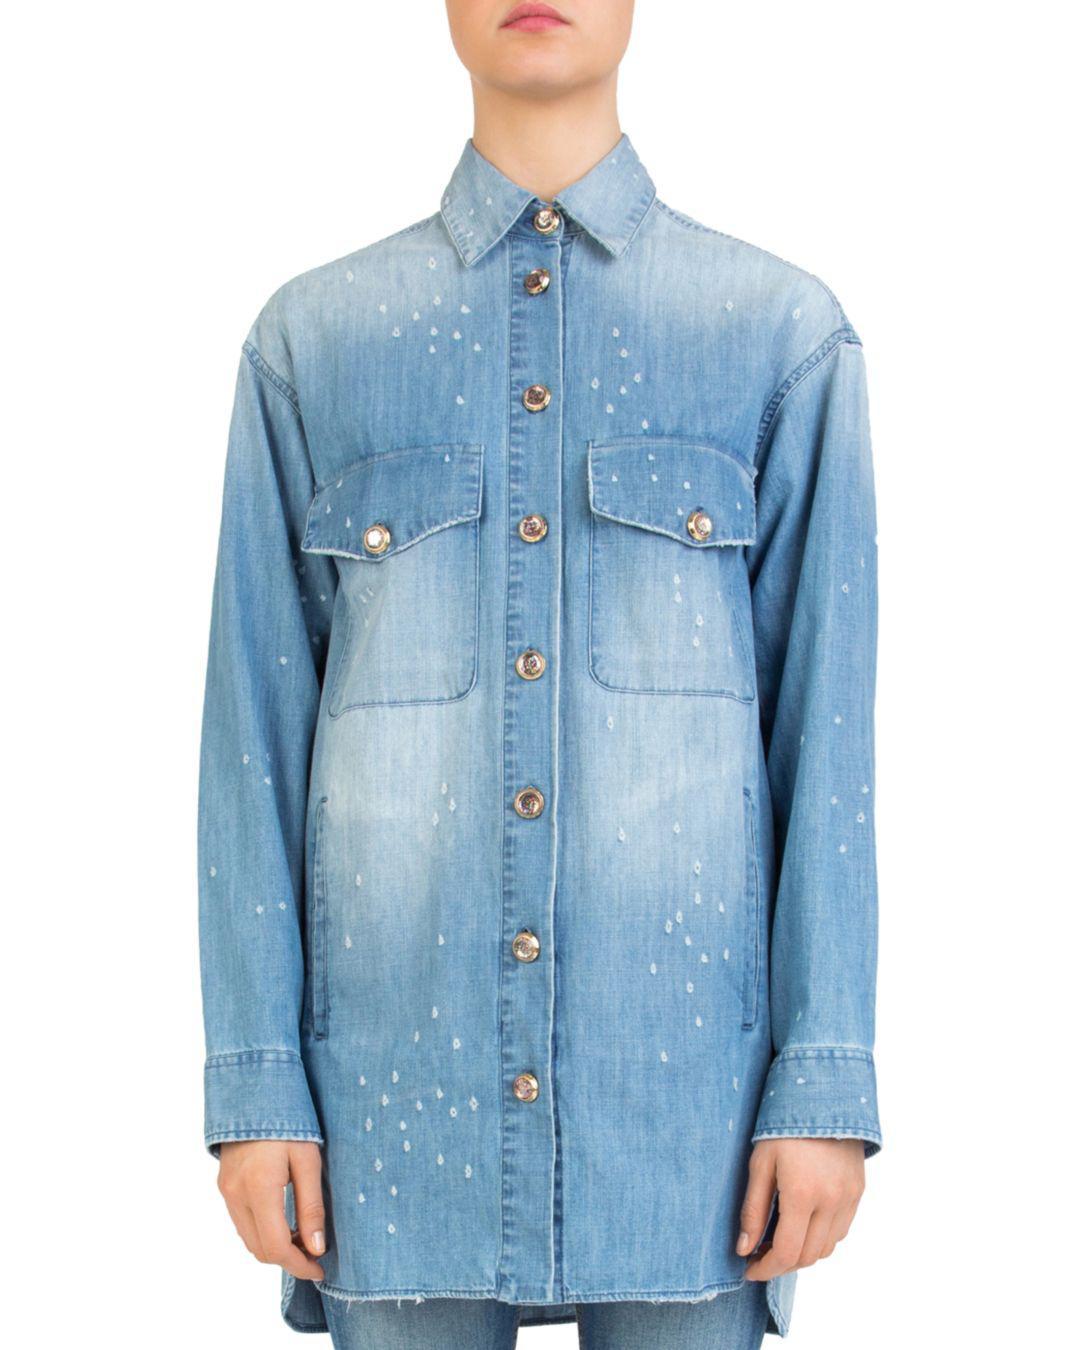 225b89717c Lyst - The Kooples Distressed Denim Overshirt in Blue